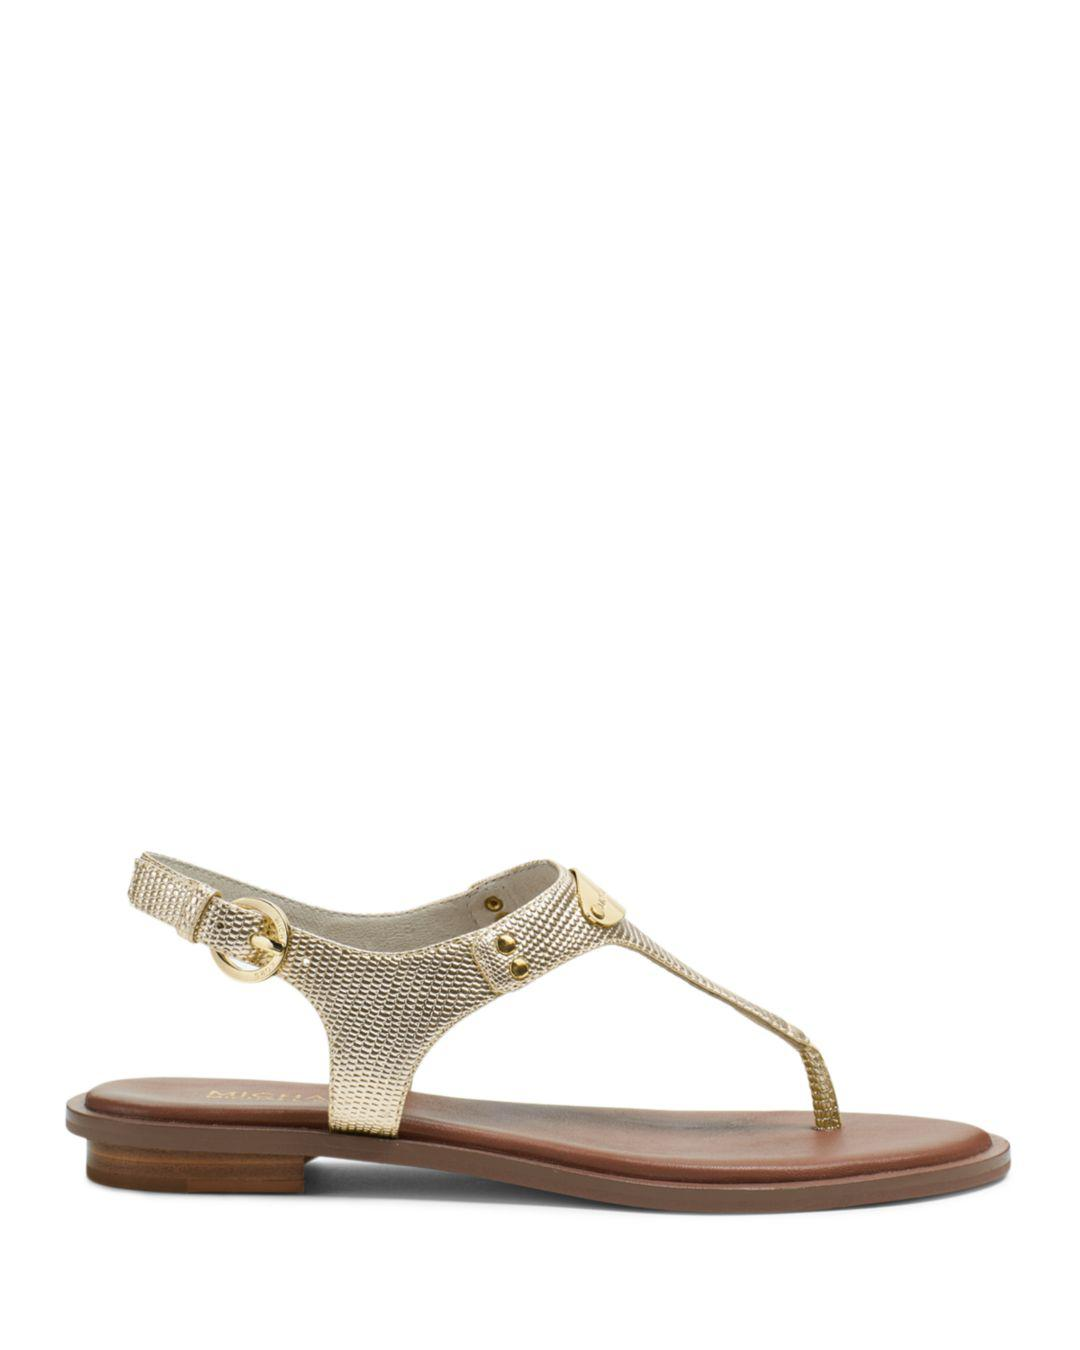 8b9dd59f2cb0 Lyst - MICHAEL Michael Kors Mk Plate Thong Sandals